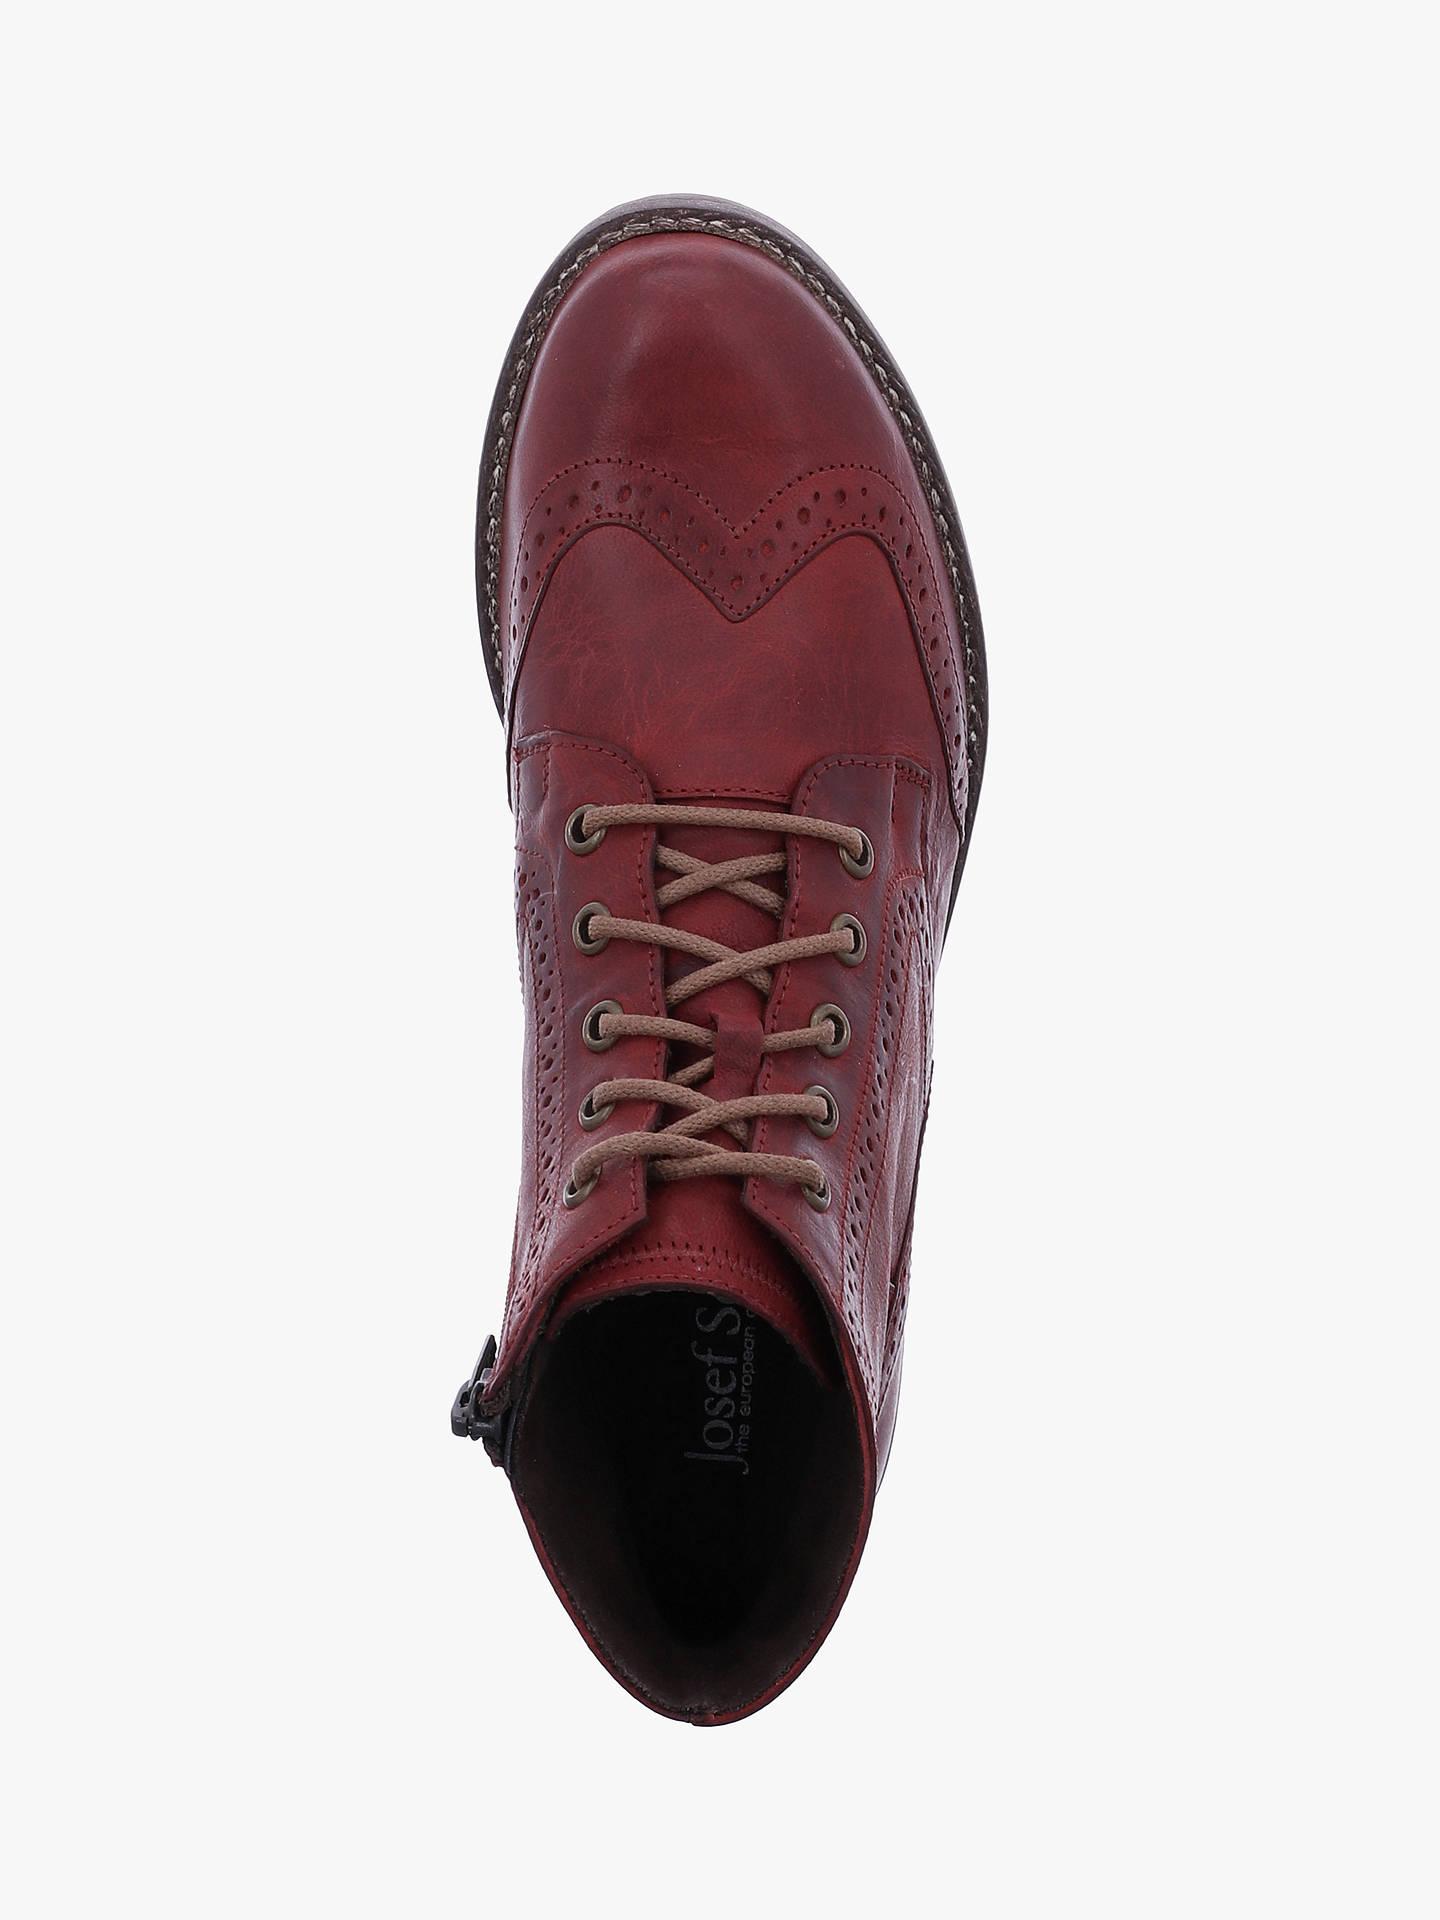 52810b171d9ba Josef Seibel Sienna 74 Leather Lace Up Ankle Boots, Bordeaux